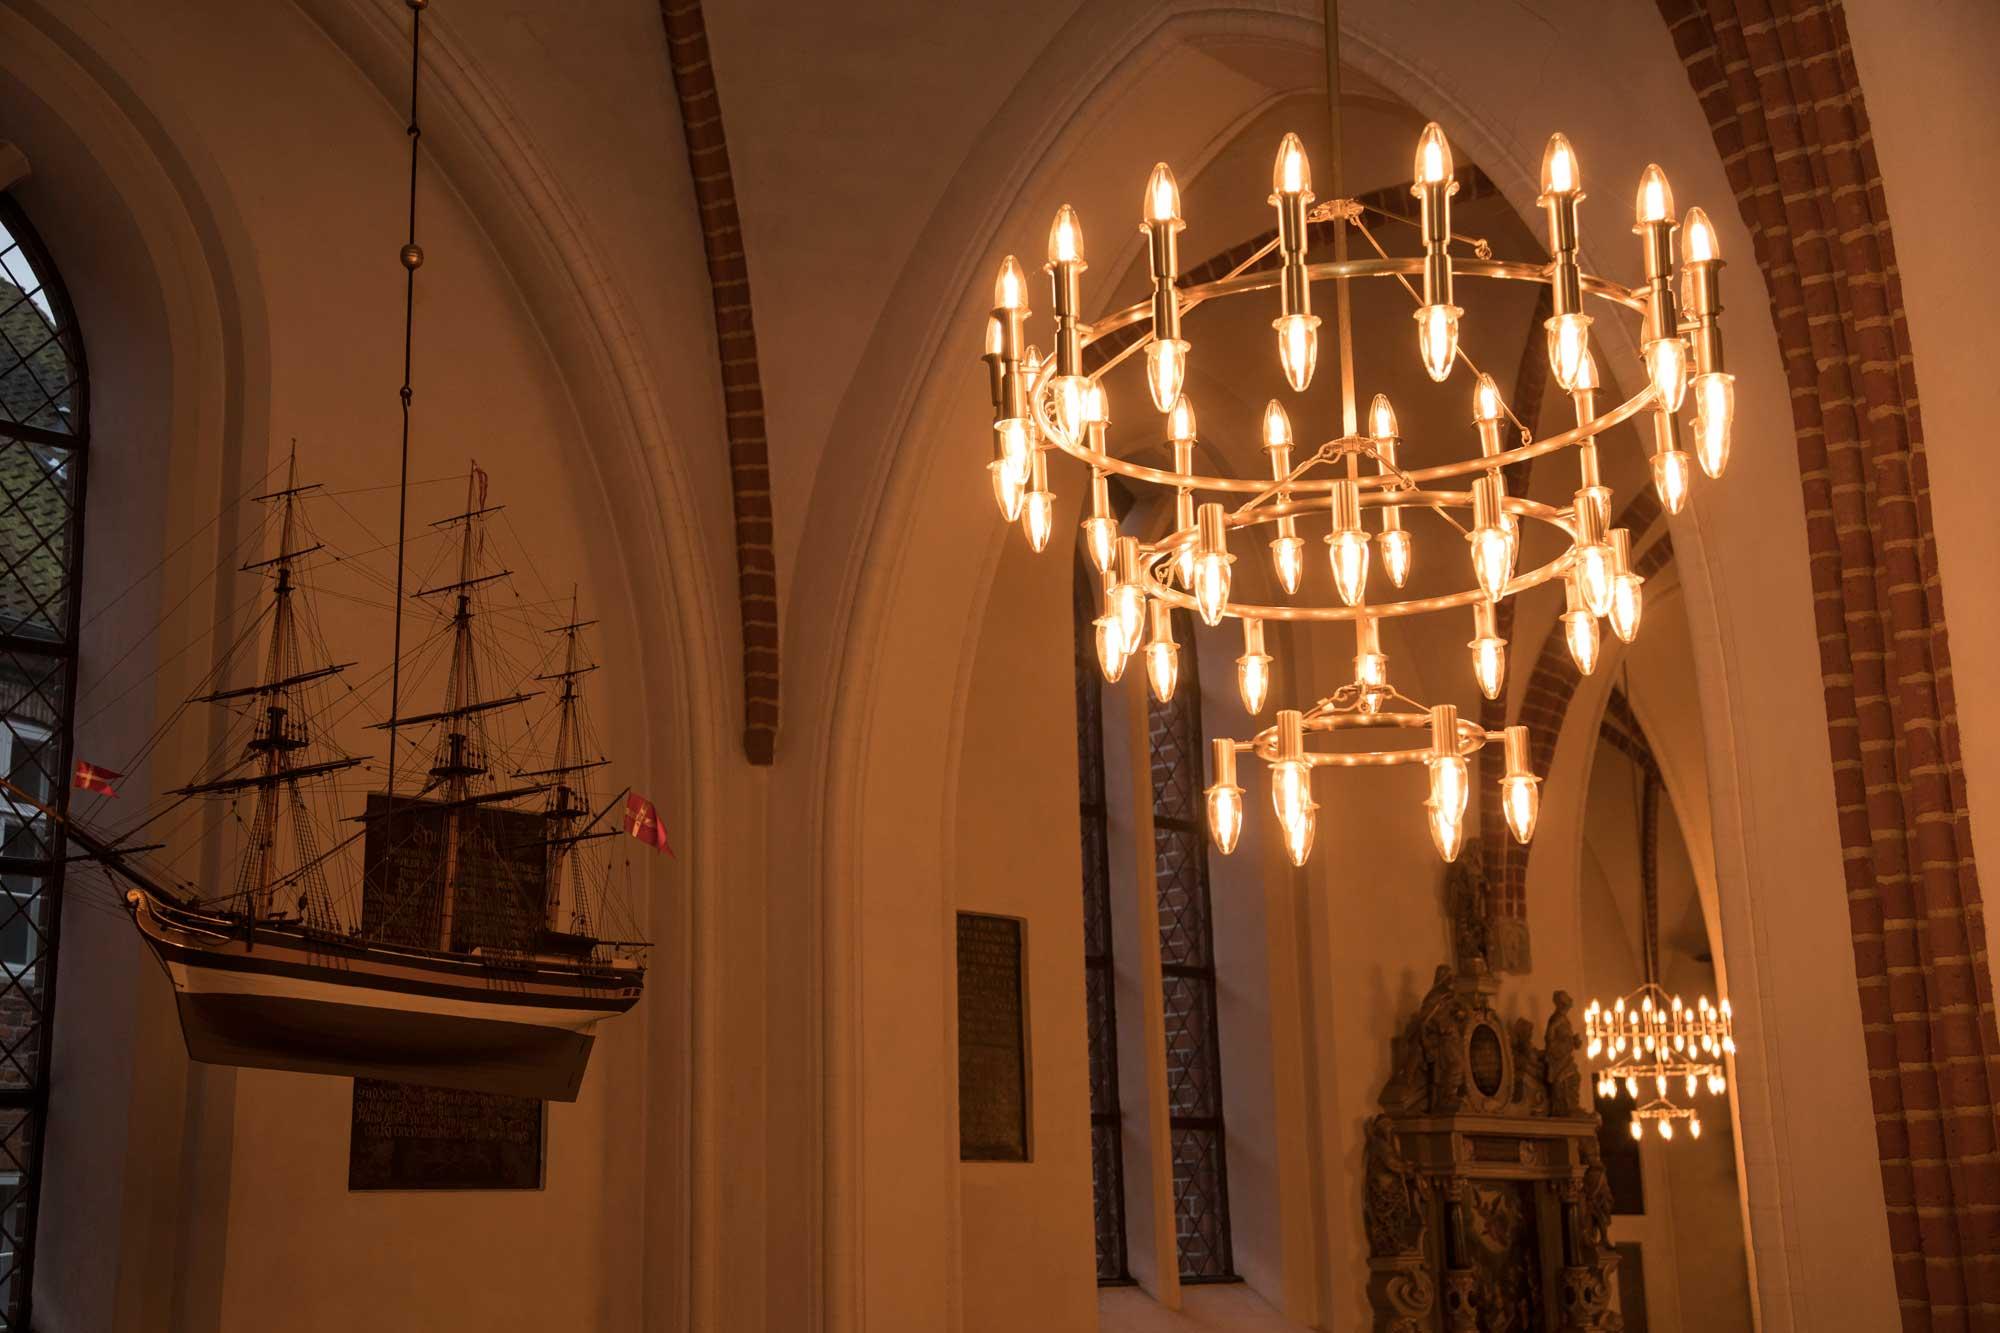 Kirkebelysning